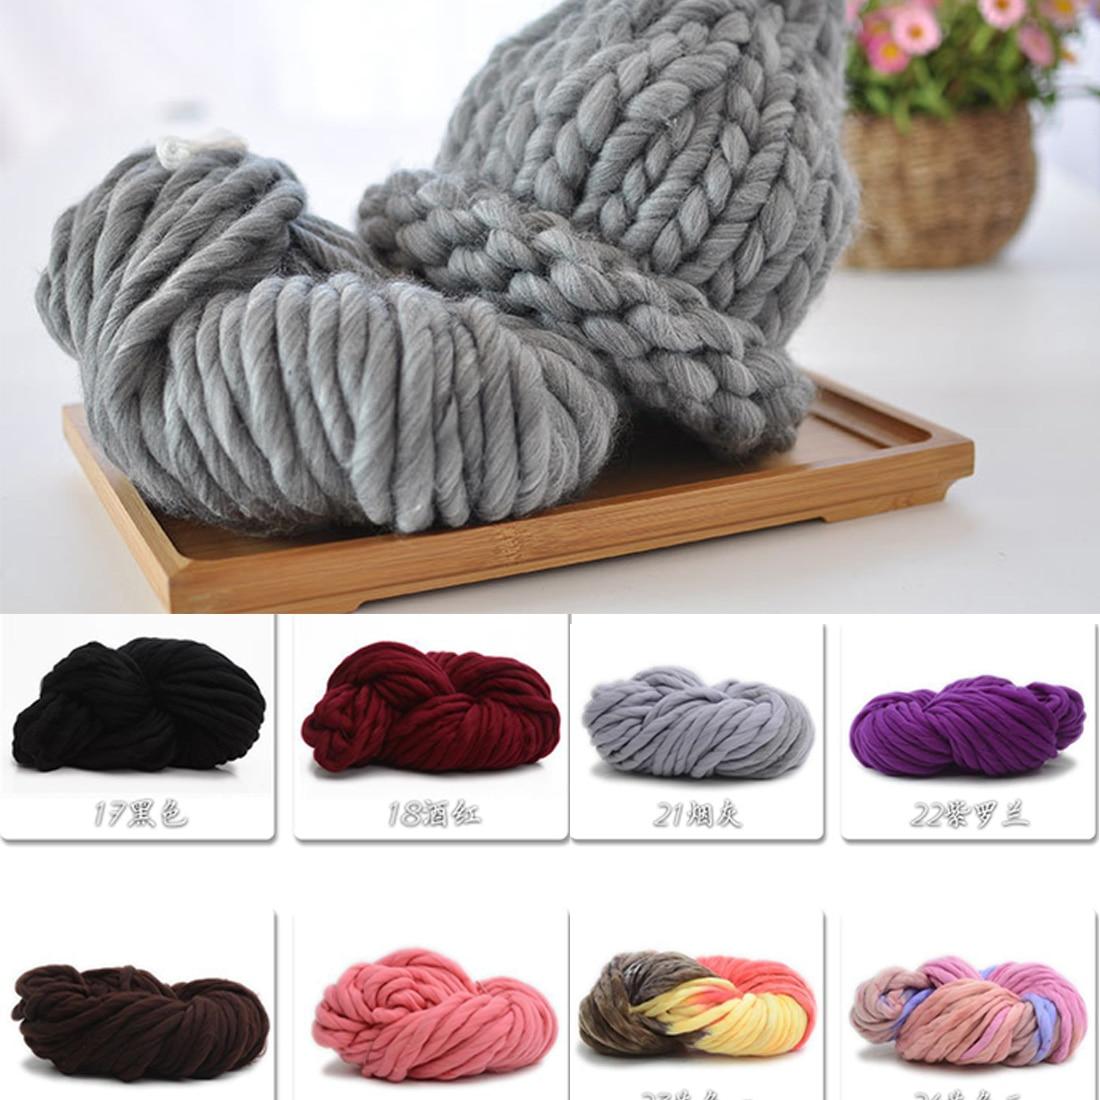 Knitting Warehouse Location : Aliexpress buy top quanity beautiful soft acrylic